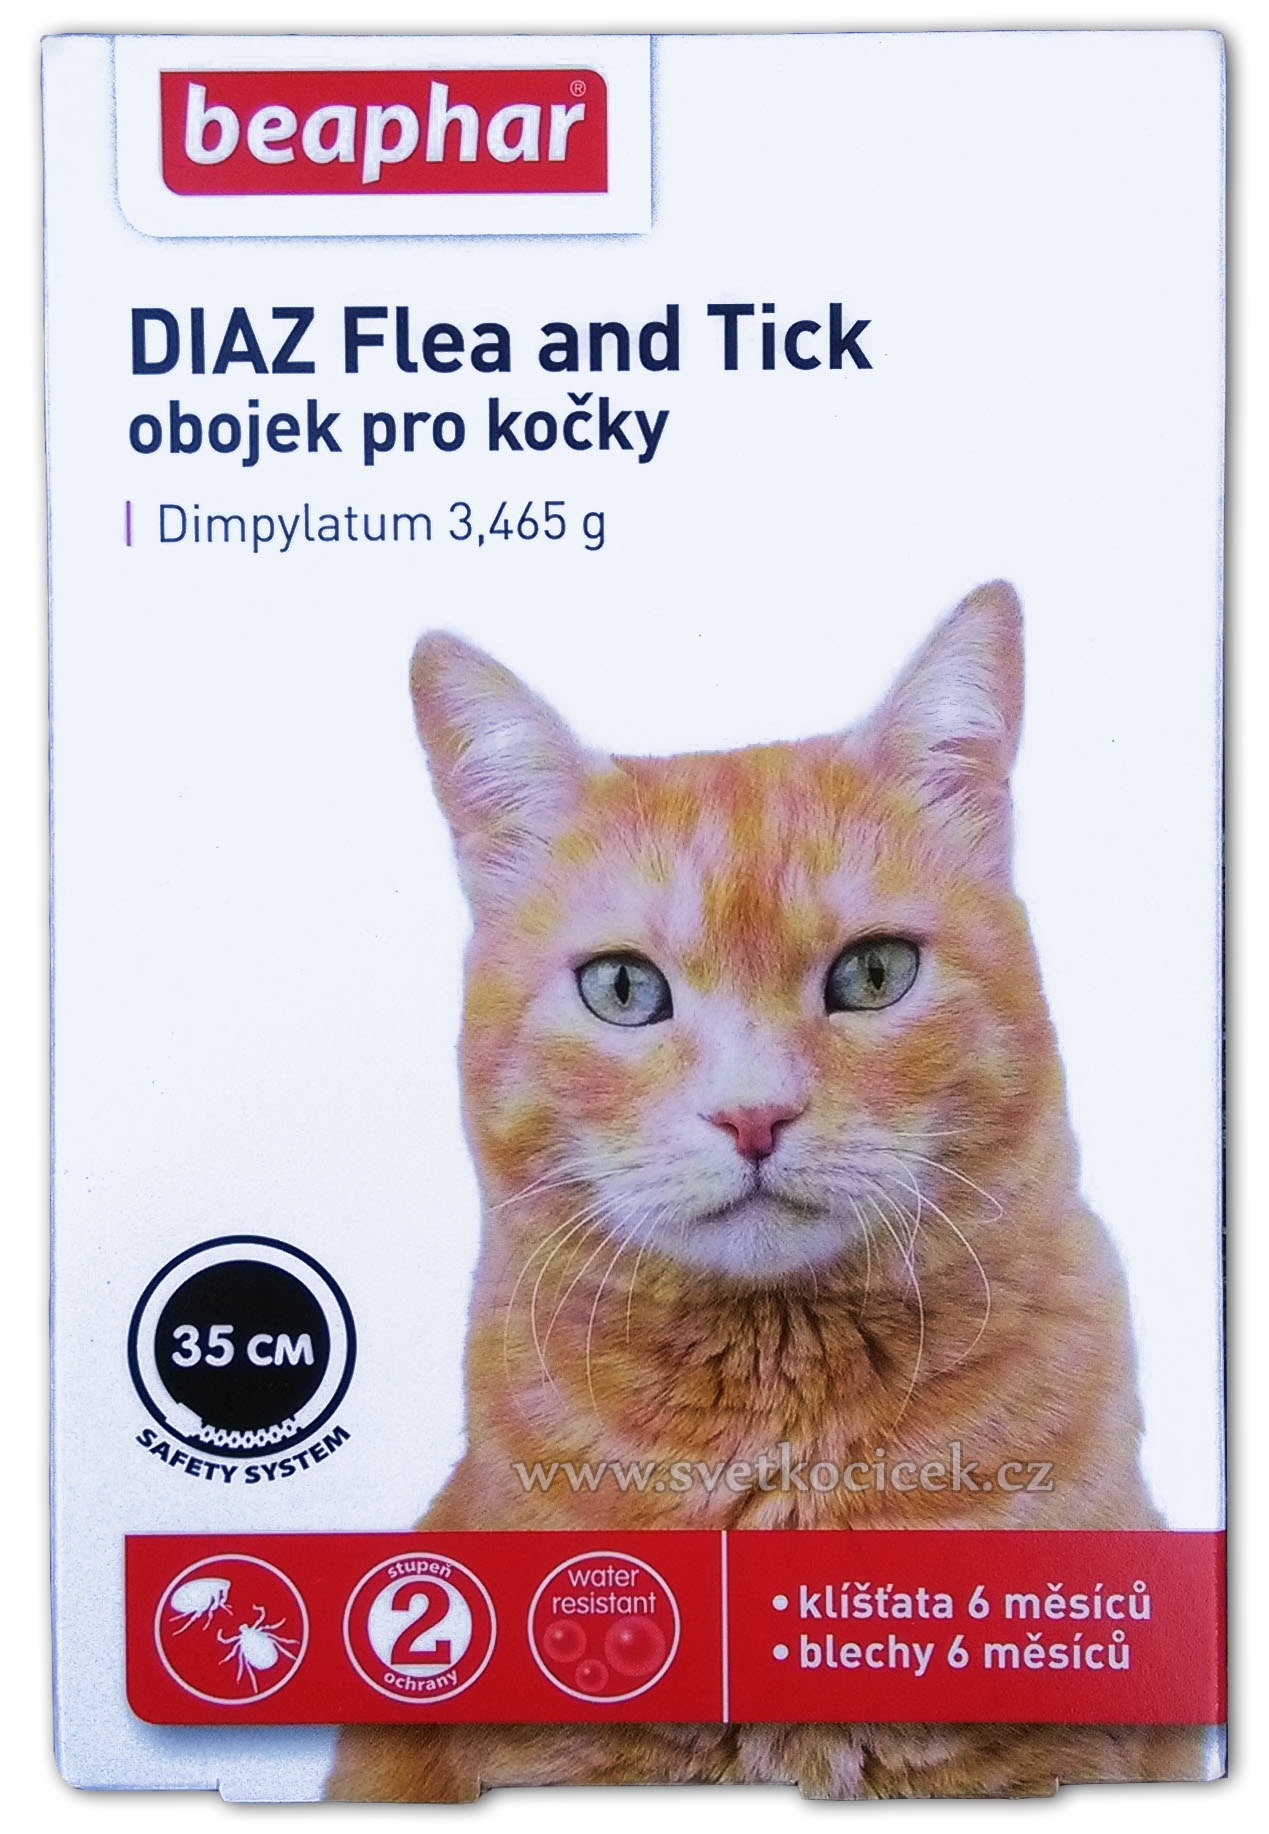 Obojek antiparazitní kočka DIAZ Flea Tick - 35 cm